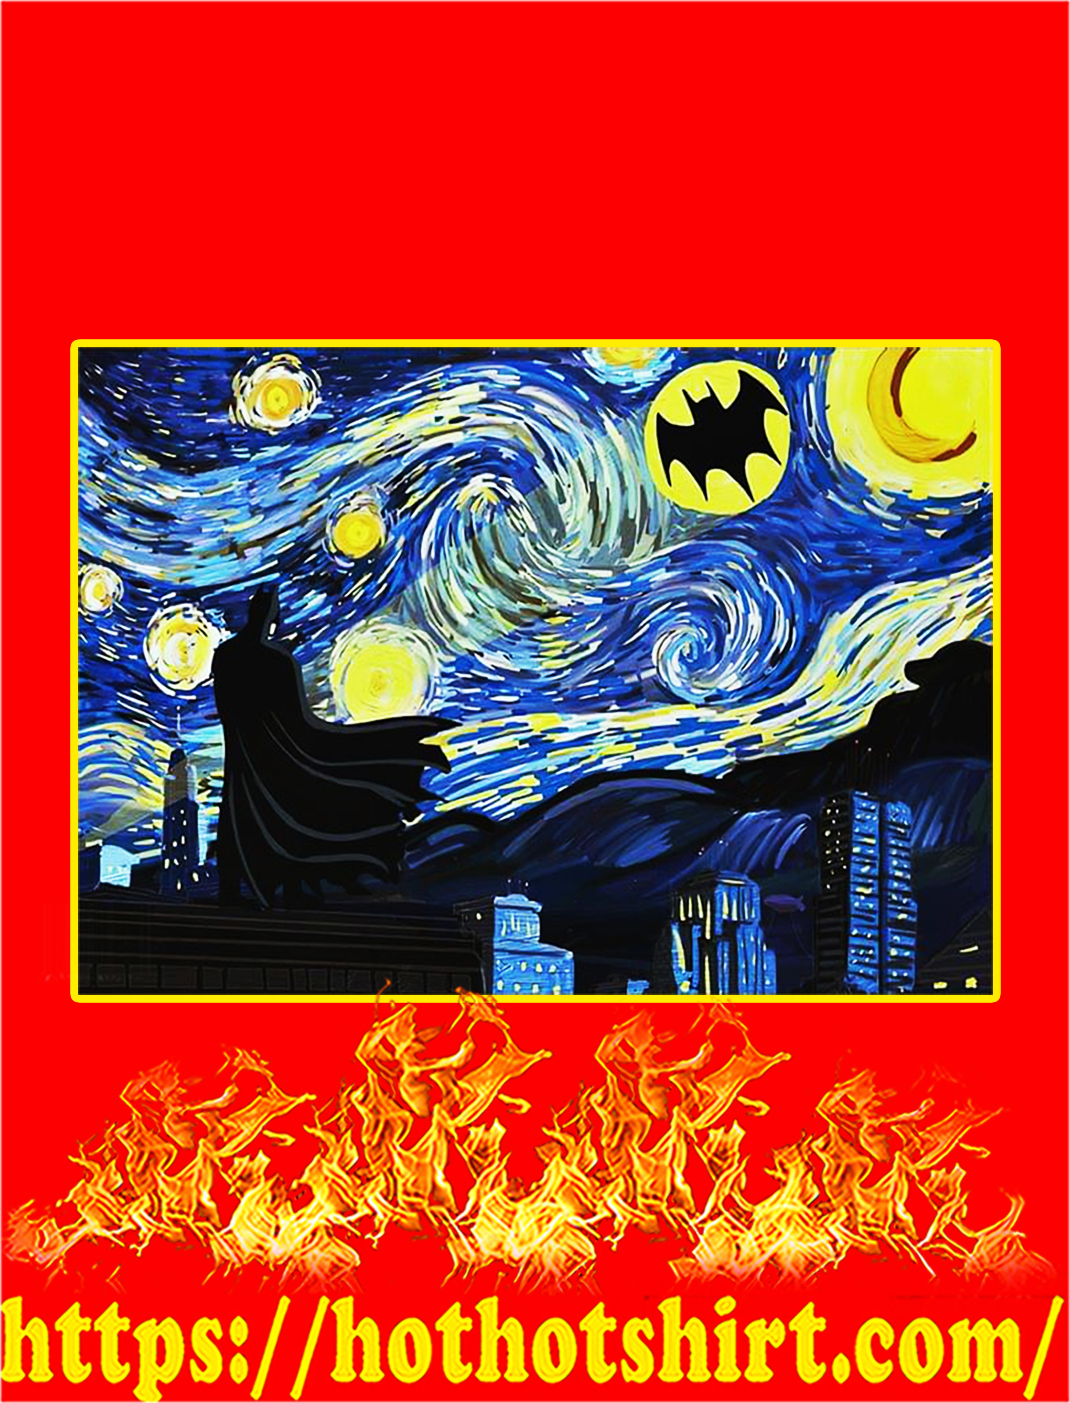 Batman starry night van gogh poster - A2